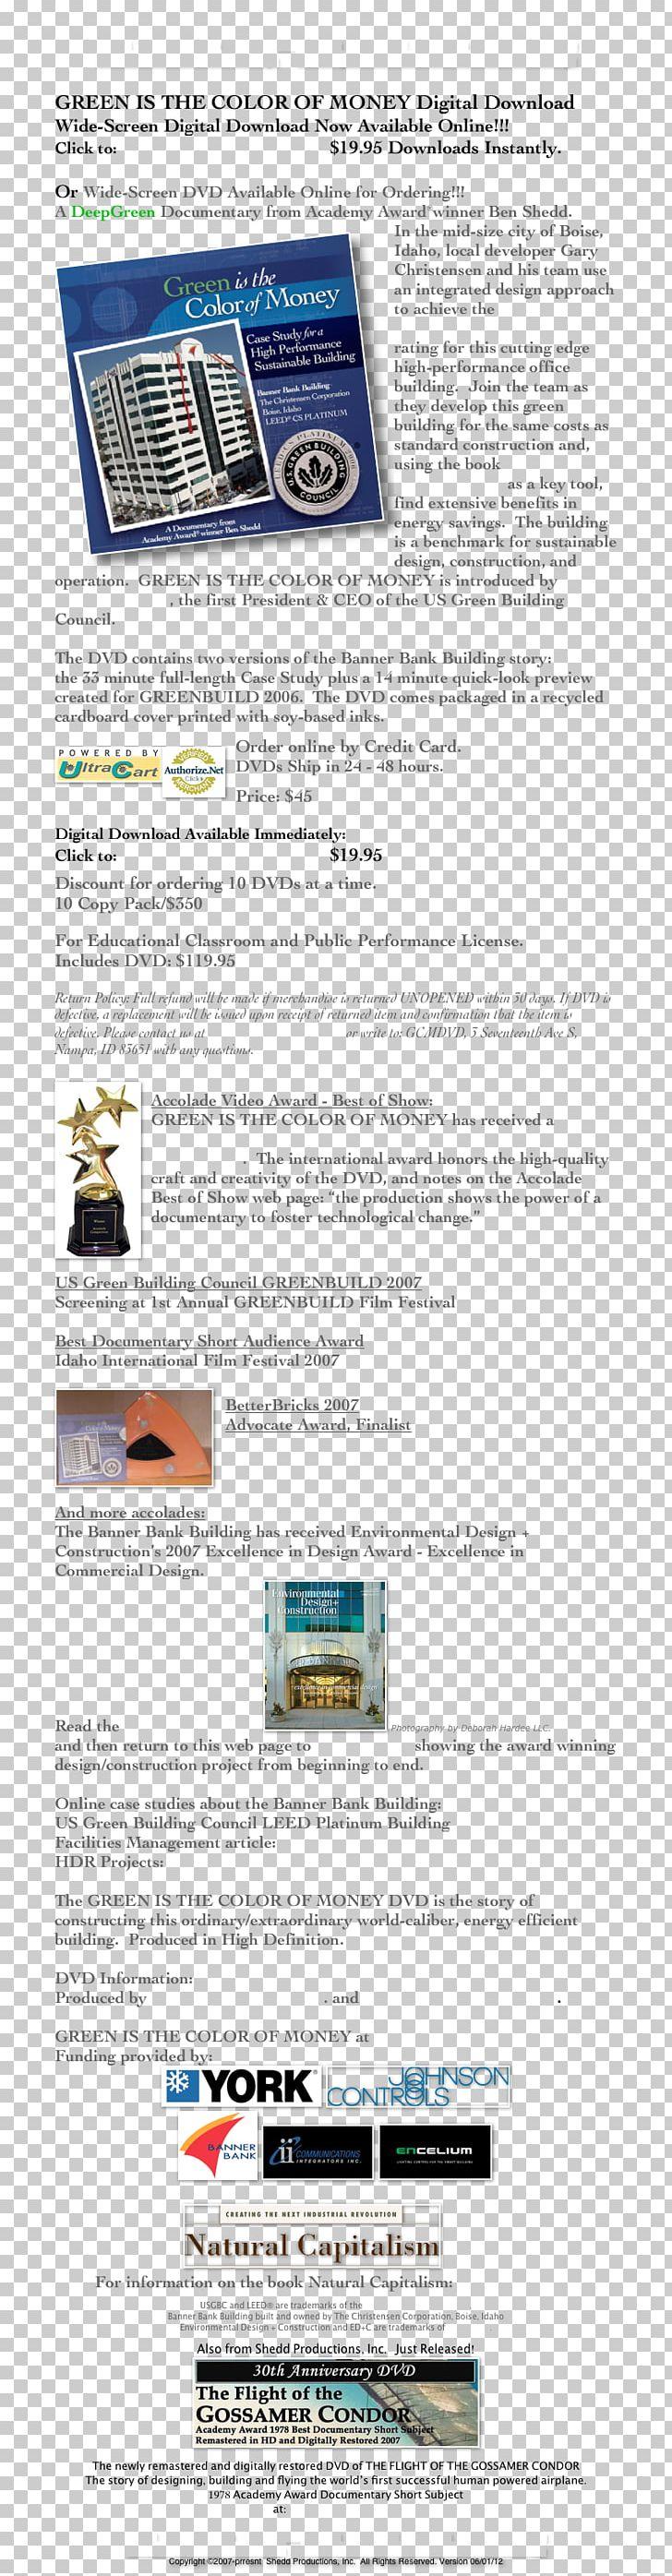 Web Page York Line Font PNG, Clipart, Ad Segmentation Line, Art, Line, Media, Text Free PNG Download